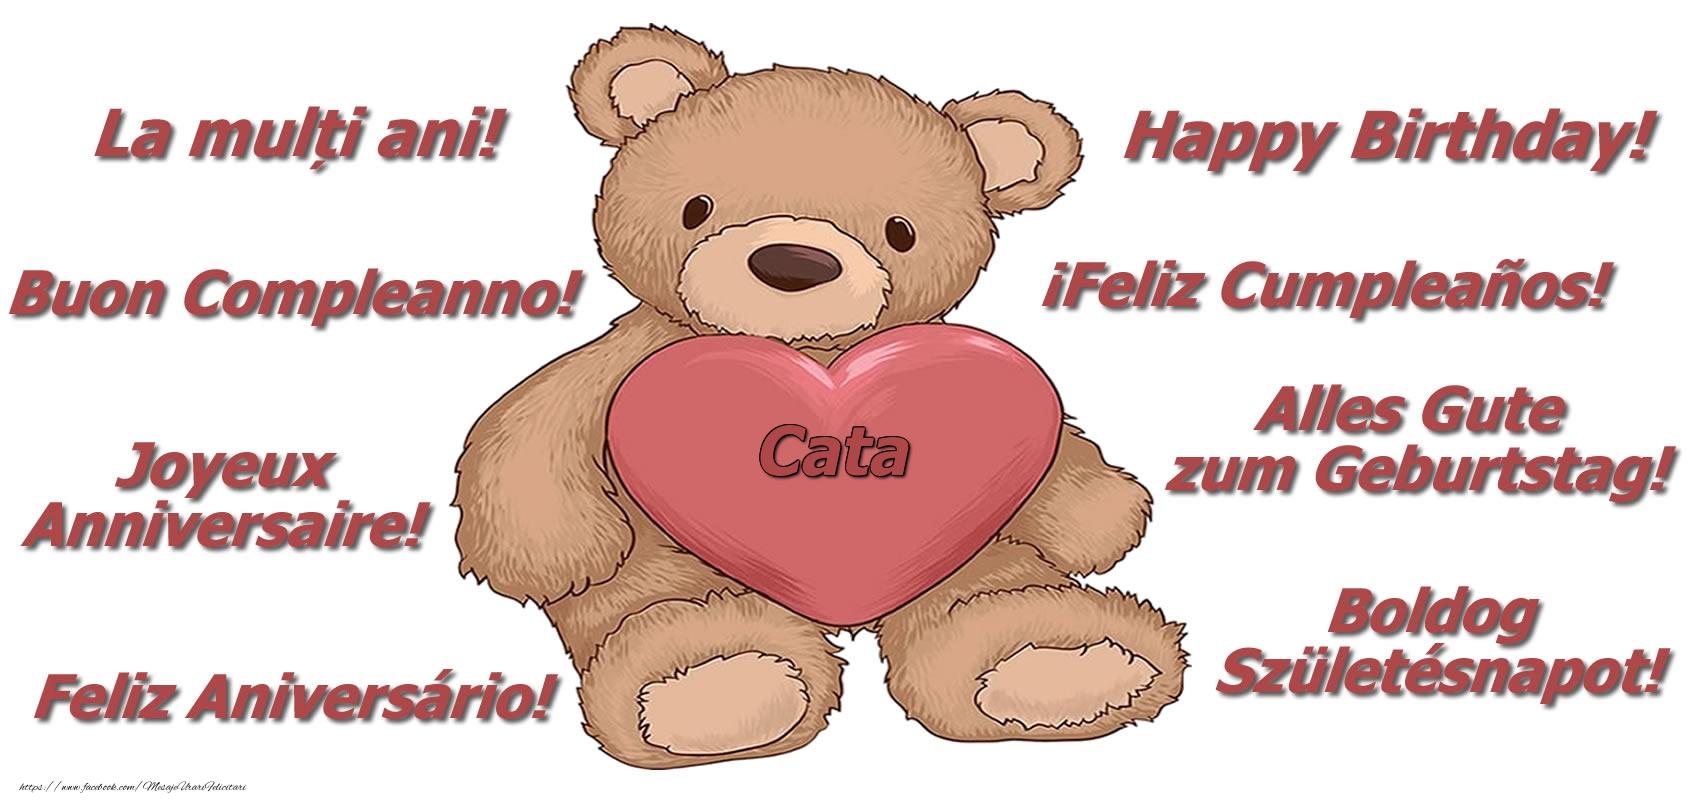 Felicitari de zi de nastere - La multi ani Cata! - Ursulet